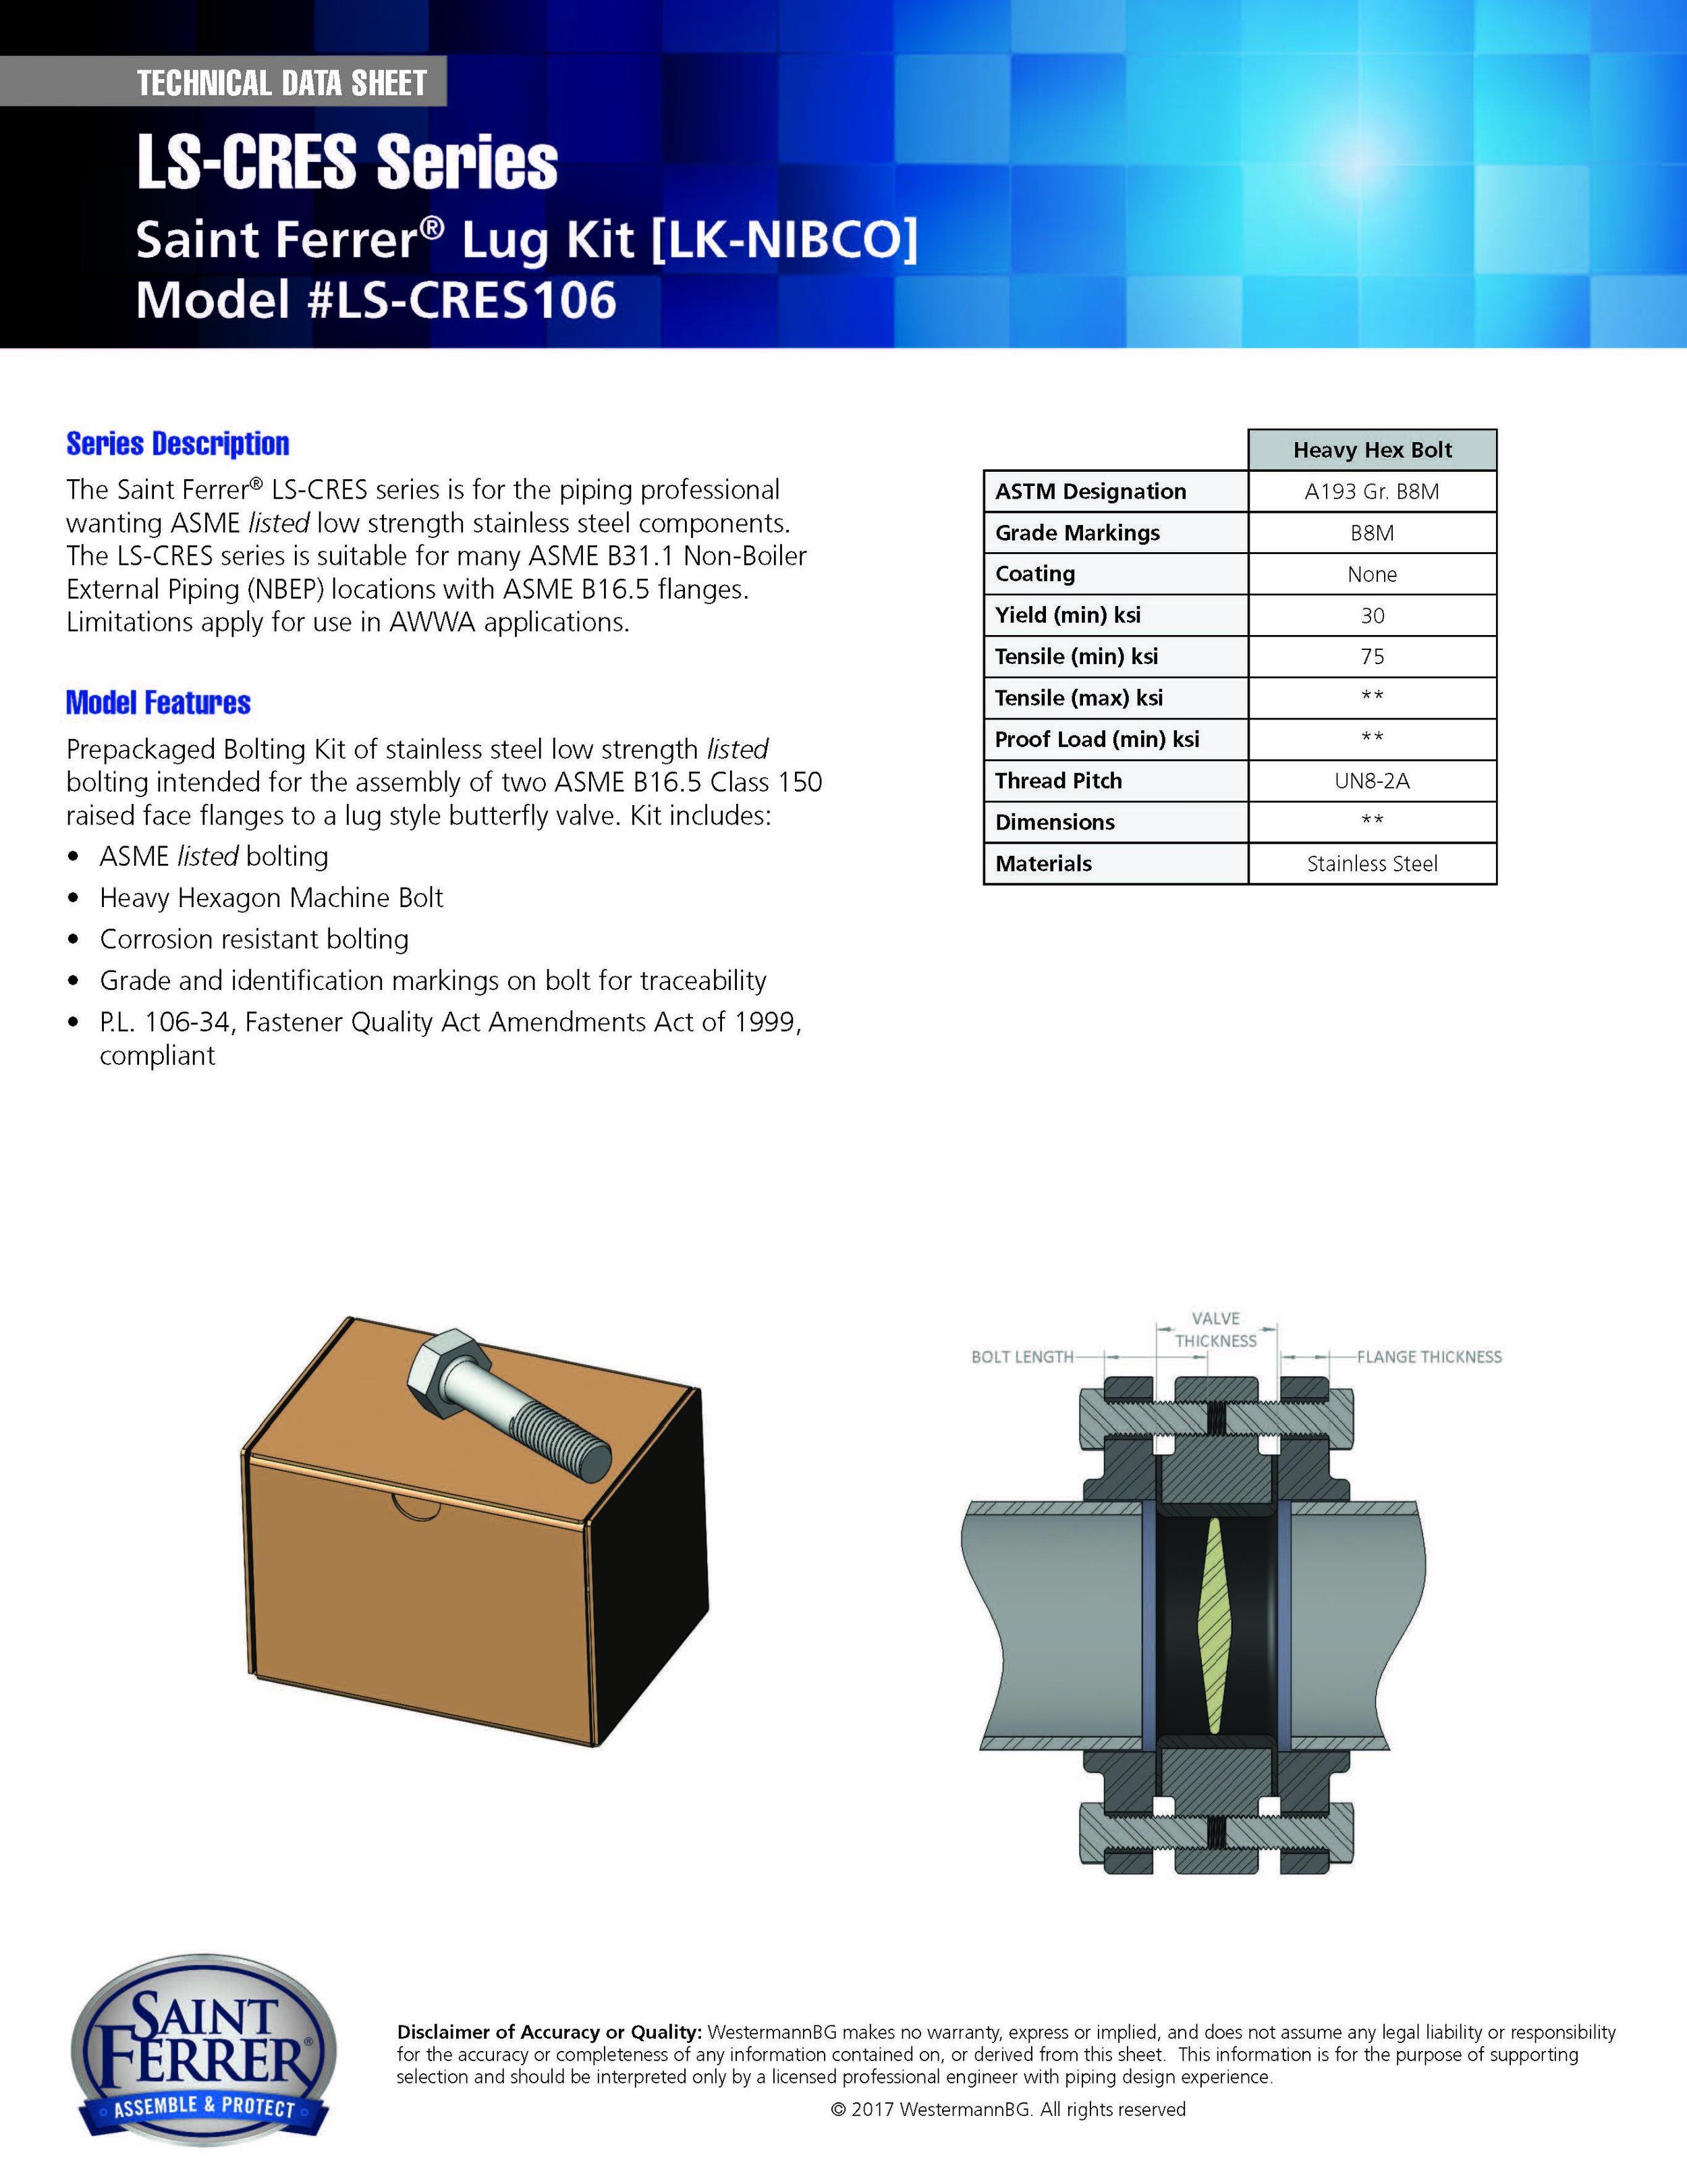 SF_Data_Sheet_LS-CRES_Series_LS-CRES106.jpg